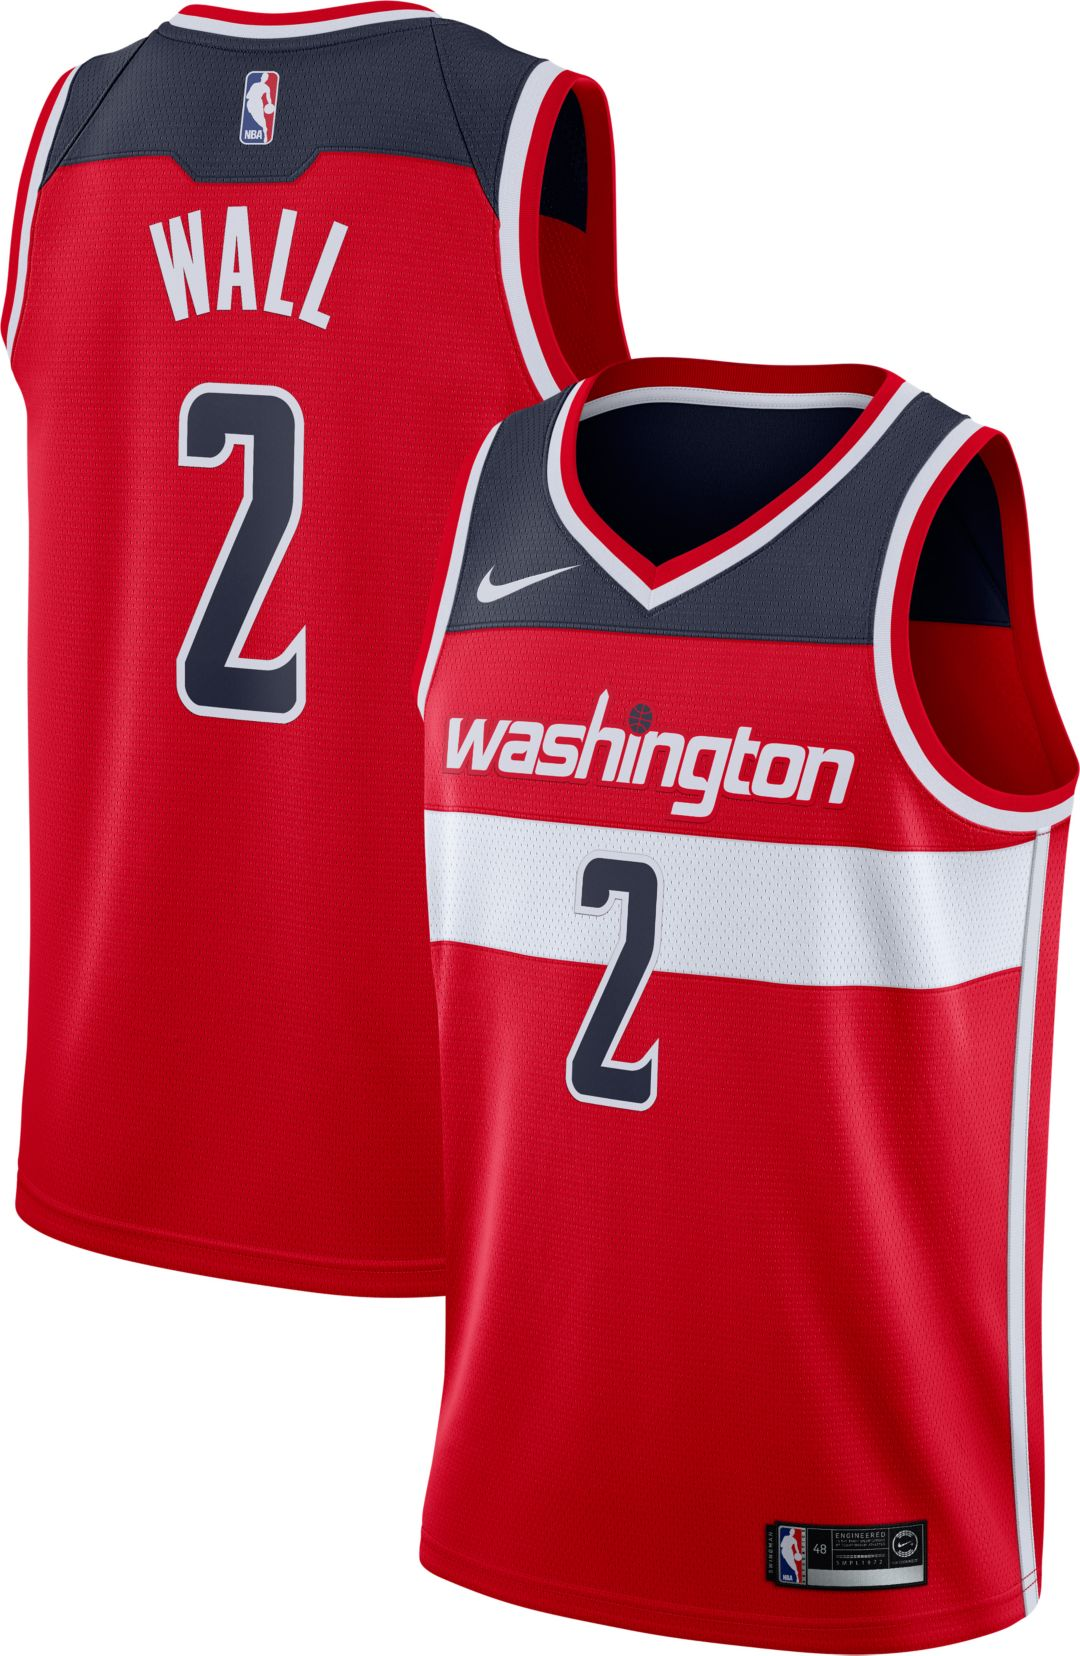 5682aa12 Nike Men's Washington Wizards John Wall #2 Red Dri-FIT Swingman ...